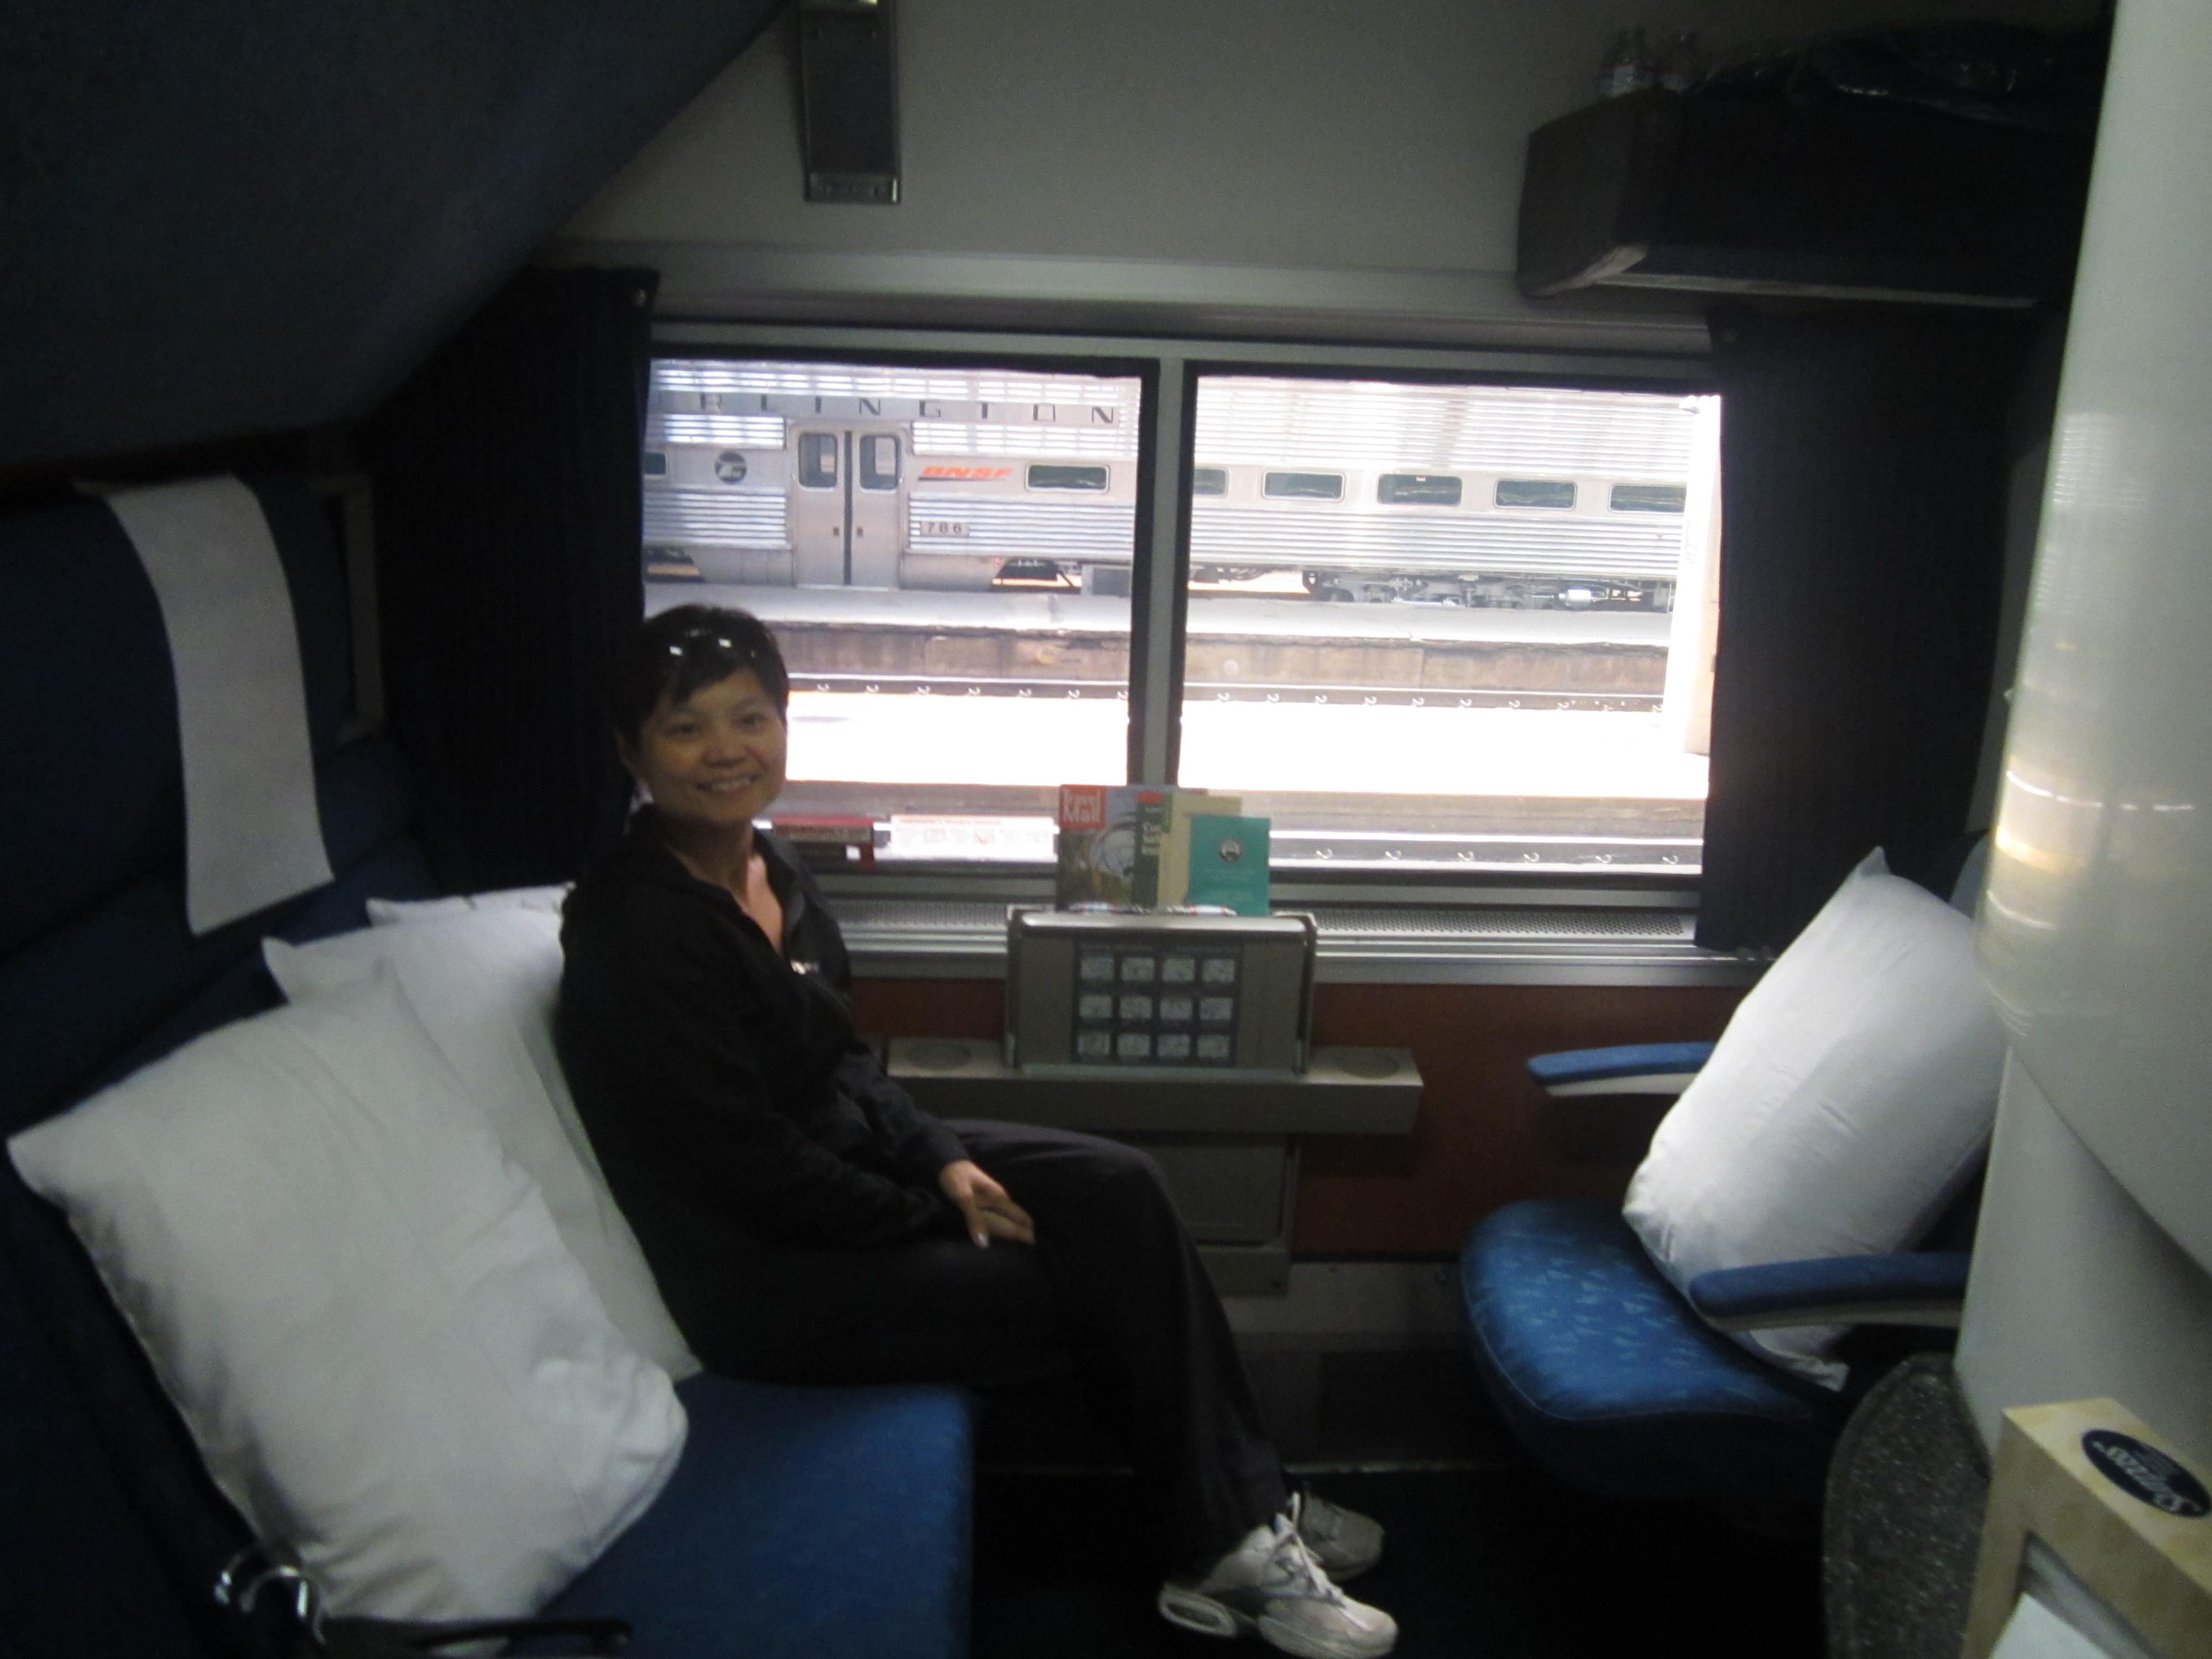 Amtrak Sleeper Car Bathroom Related Keywords & Suggestions Amtrak Sleep